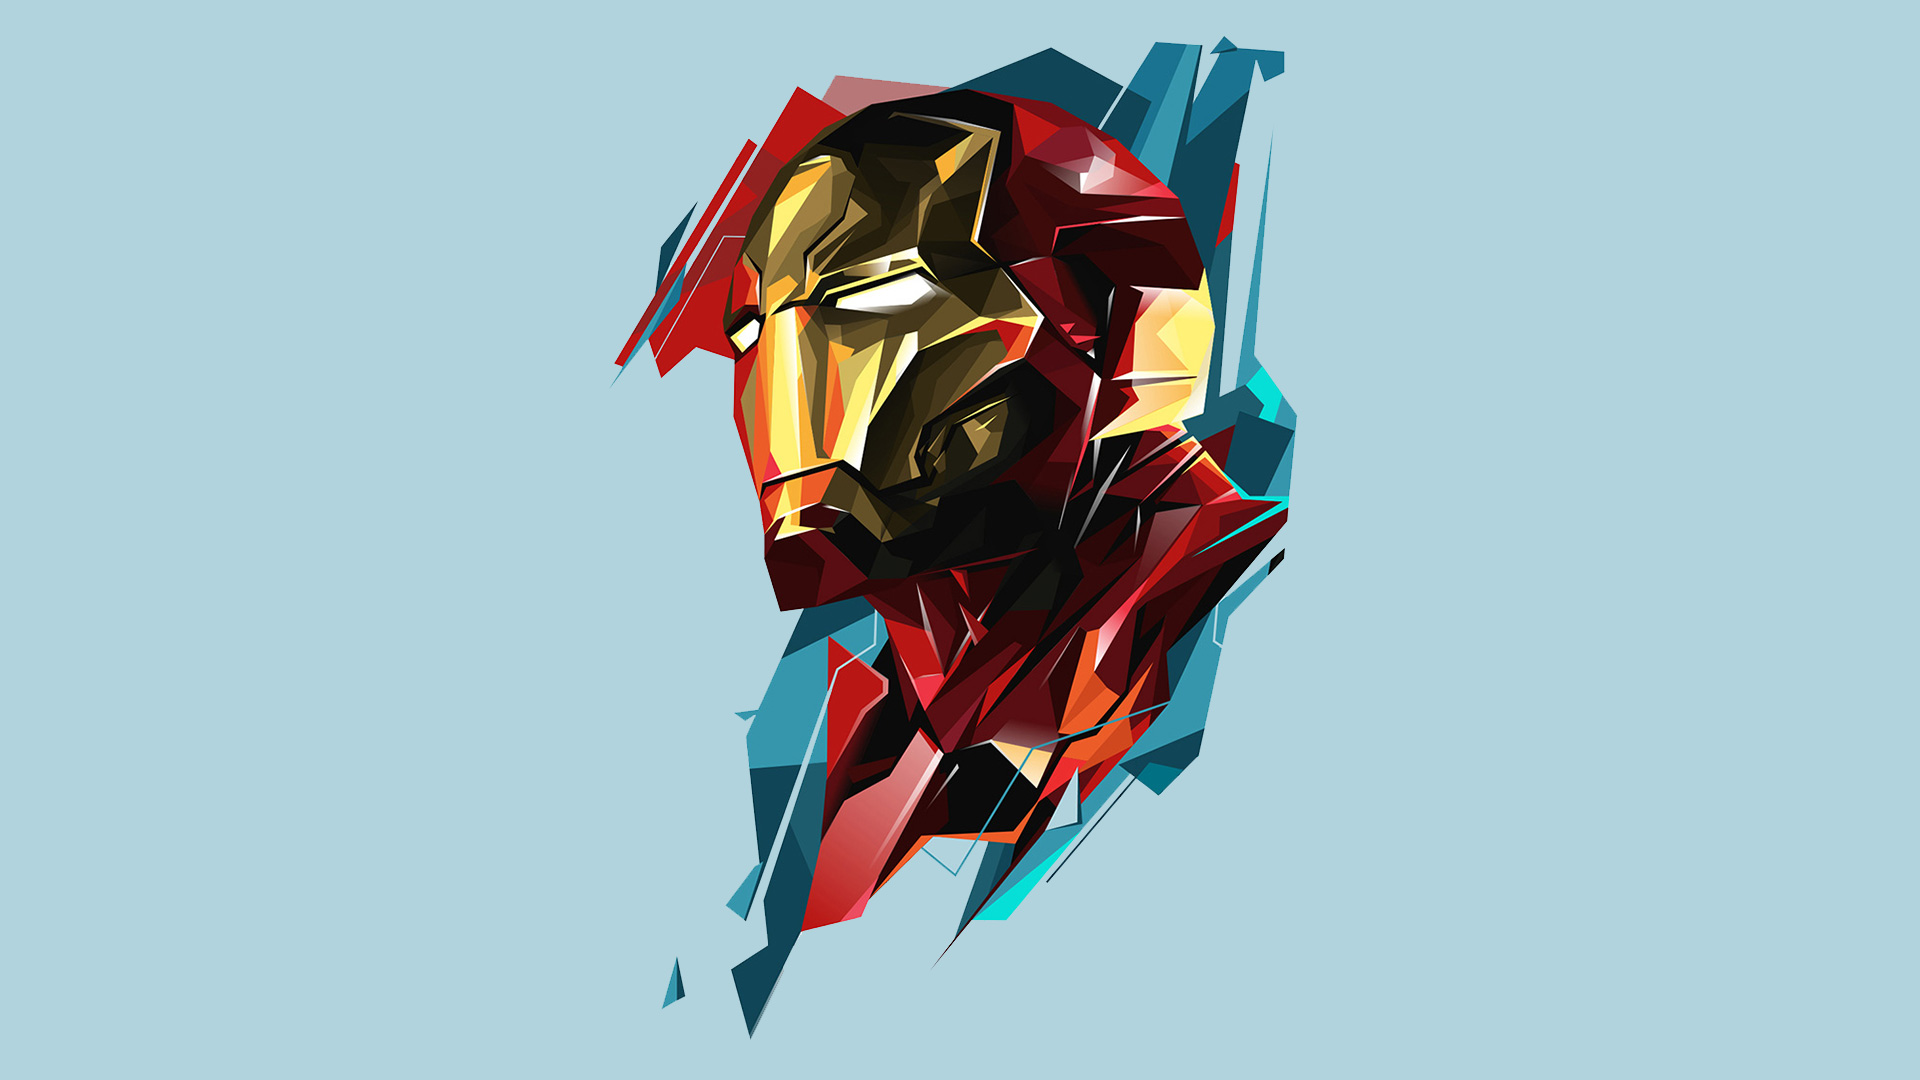 1080x1920 Iron Man Marvel Heroes Art Iphone 7,6s,6 Plus